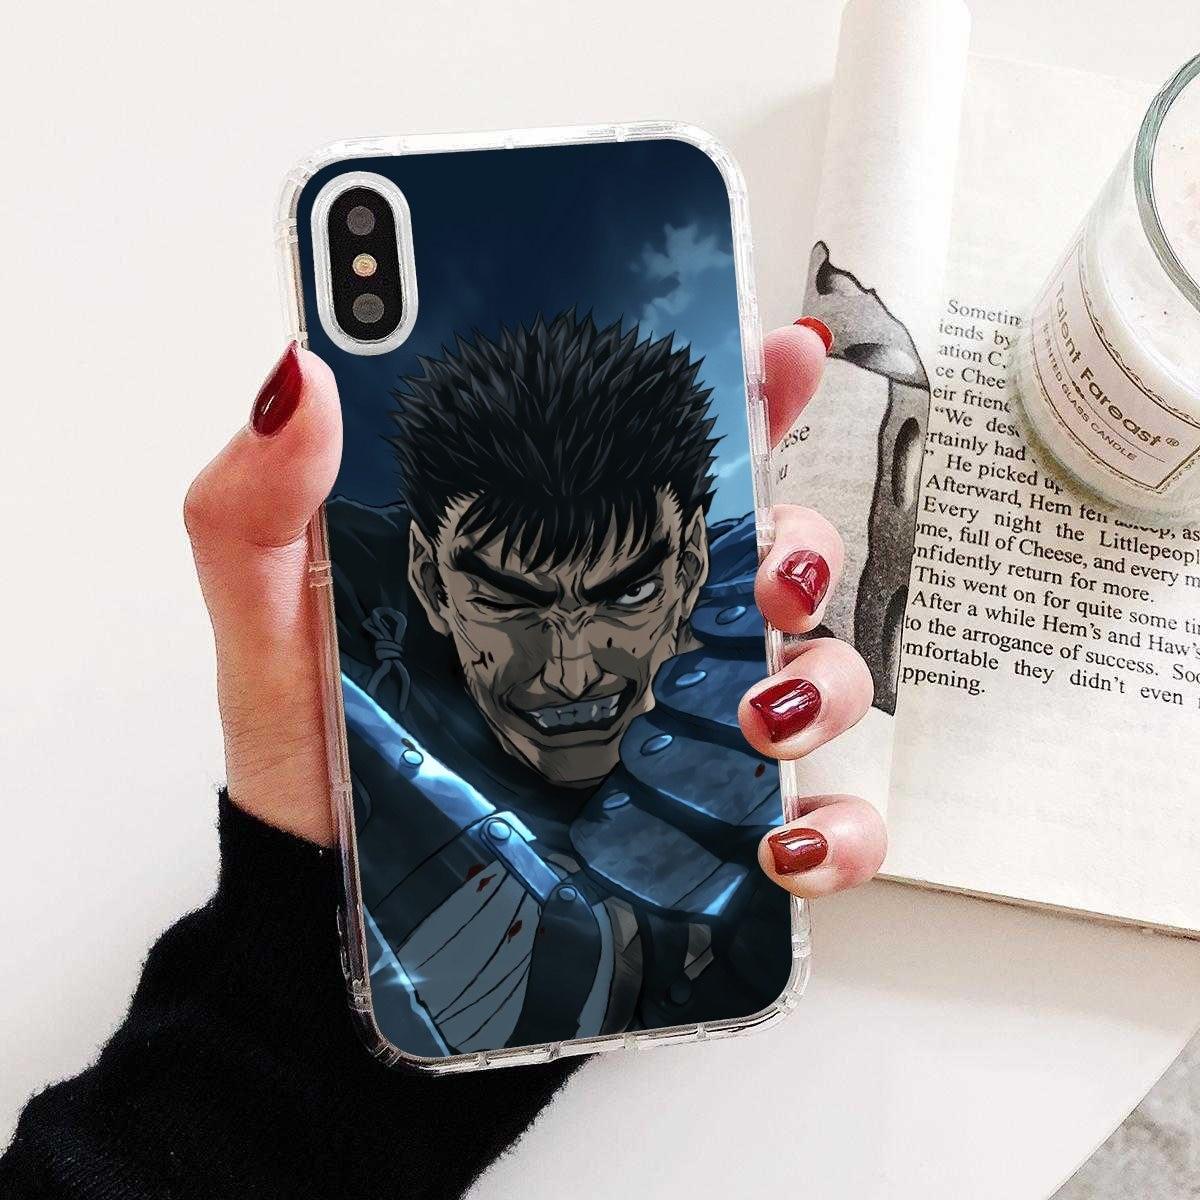 Loco agallas Anime bien Collage de silicona caso de teléfono para Samsung Galaxy nota 2 3 4 5 8 9 S2 S3 S4 S5 Mini S6 S7 borde S8 S9 Plus